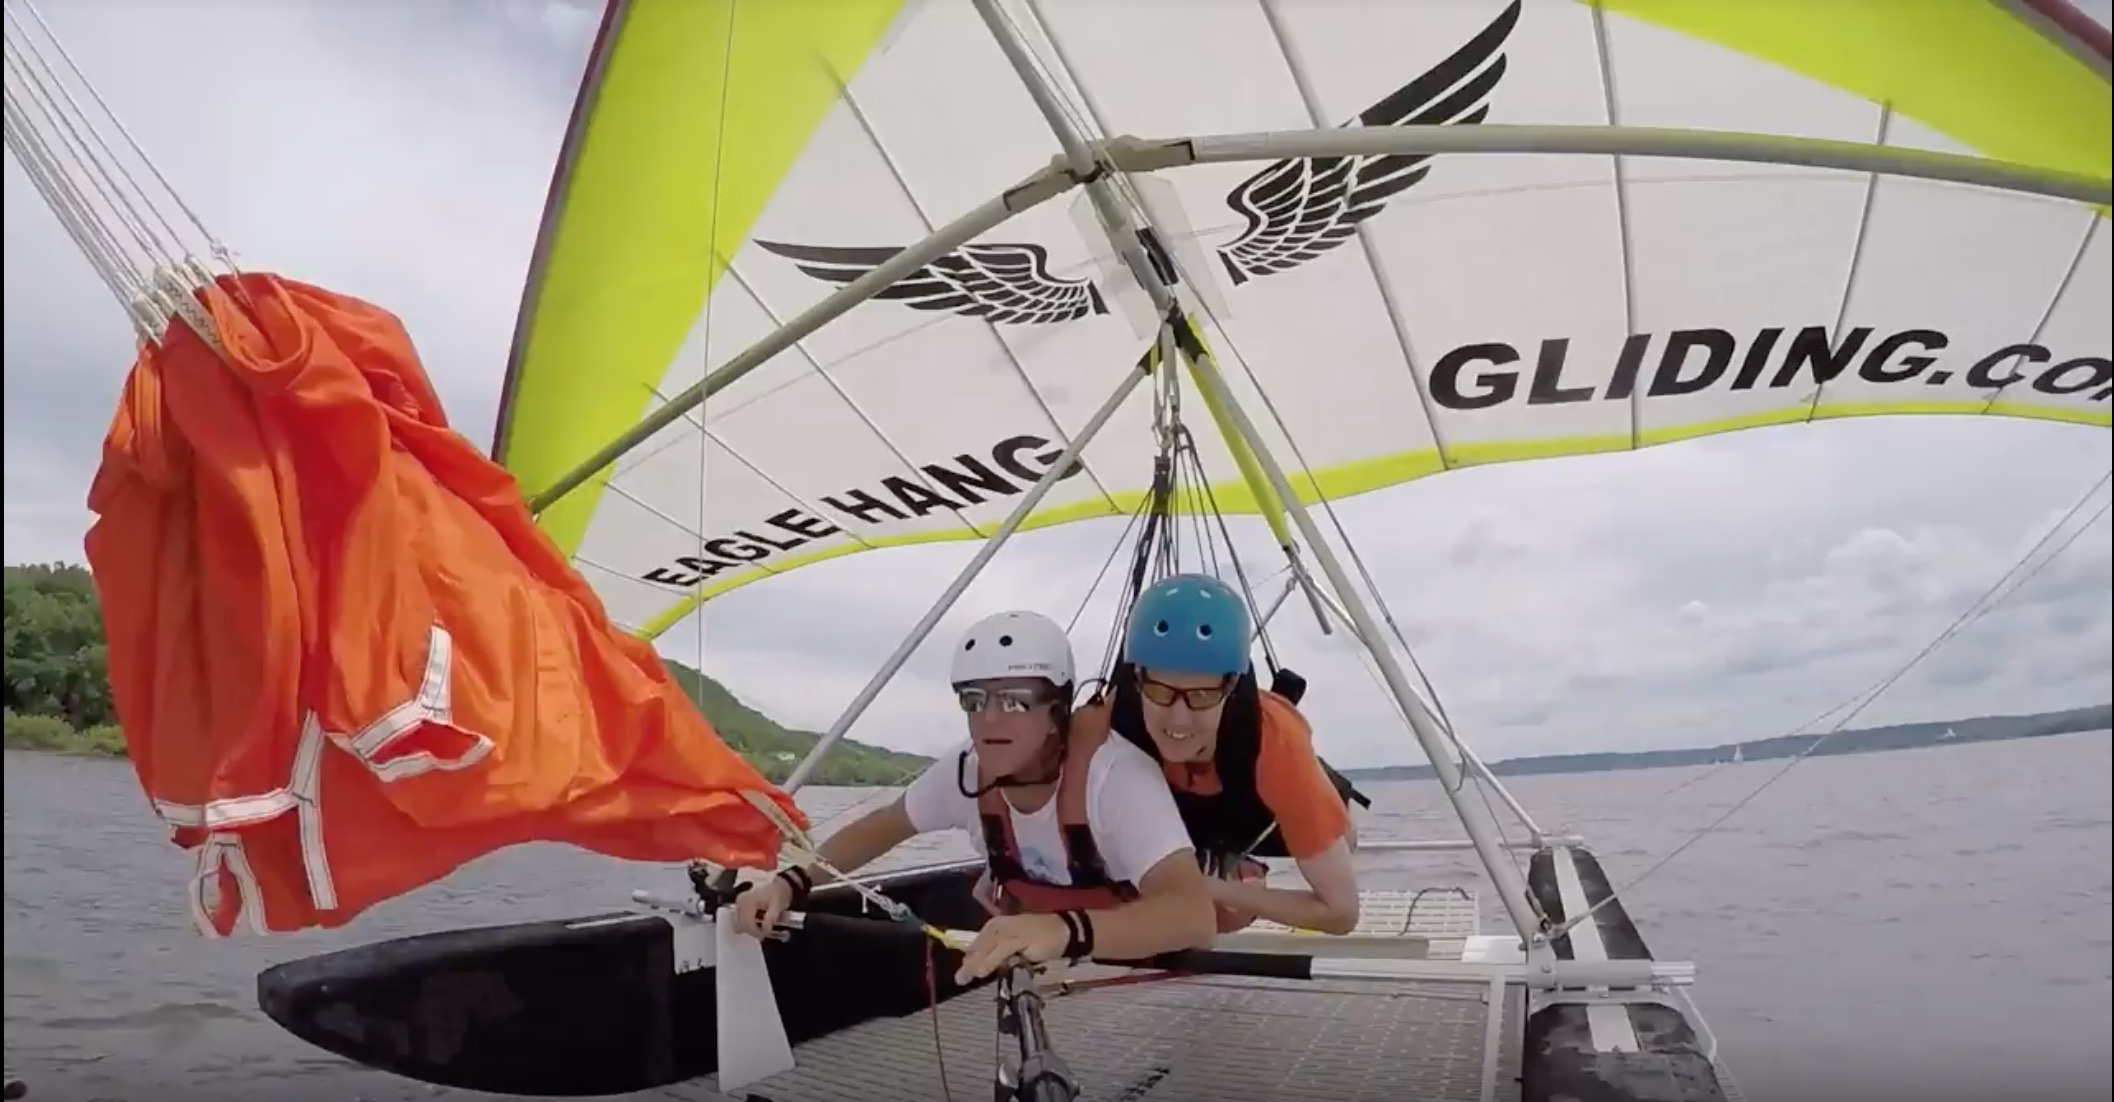 wish recipient michael hang gliding